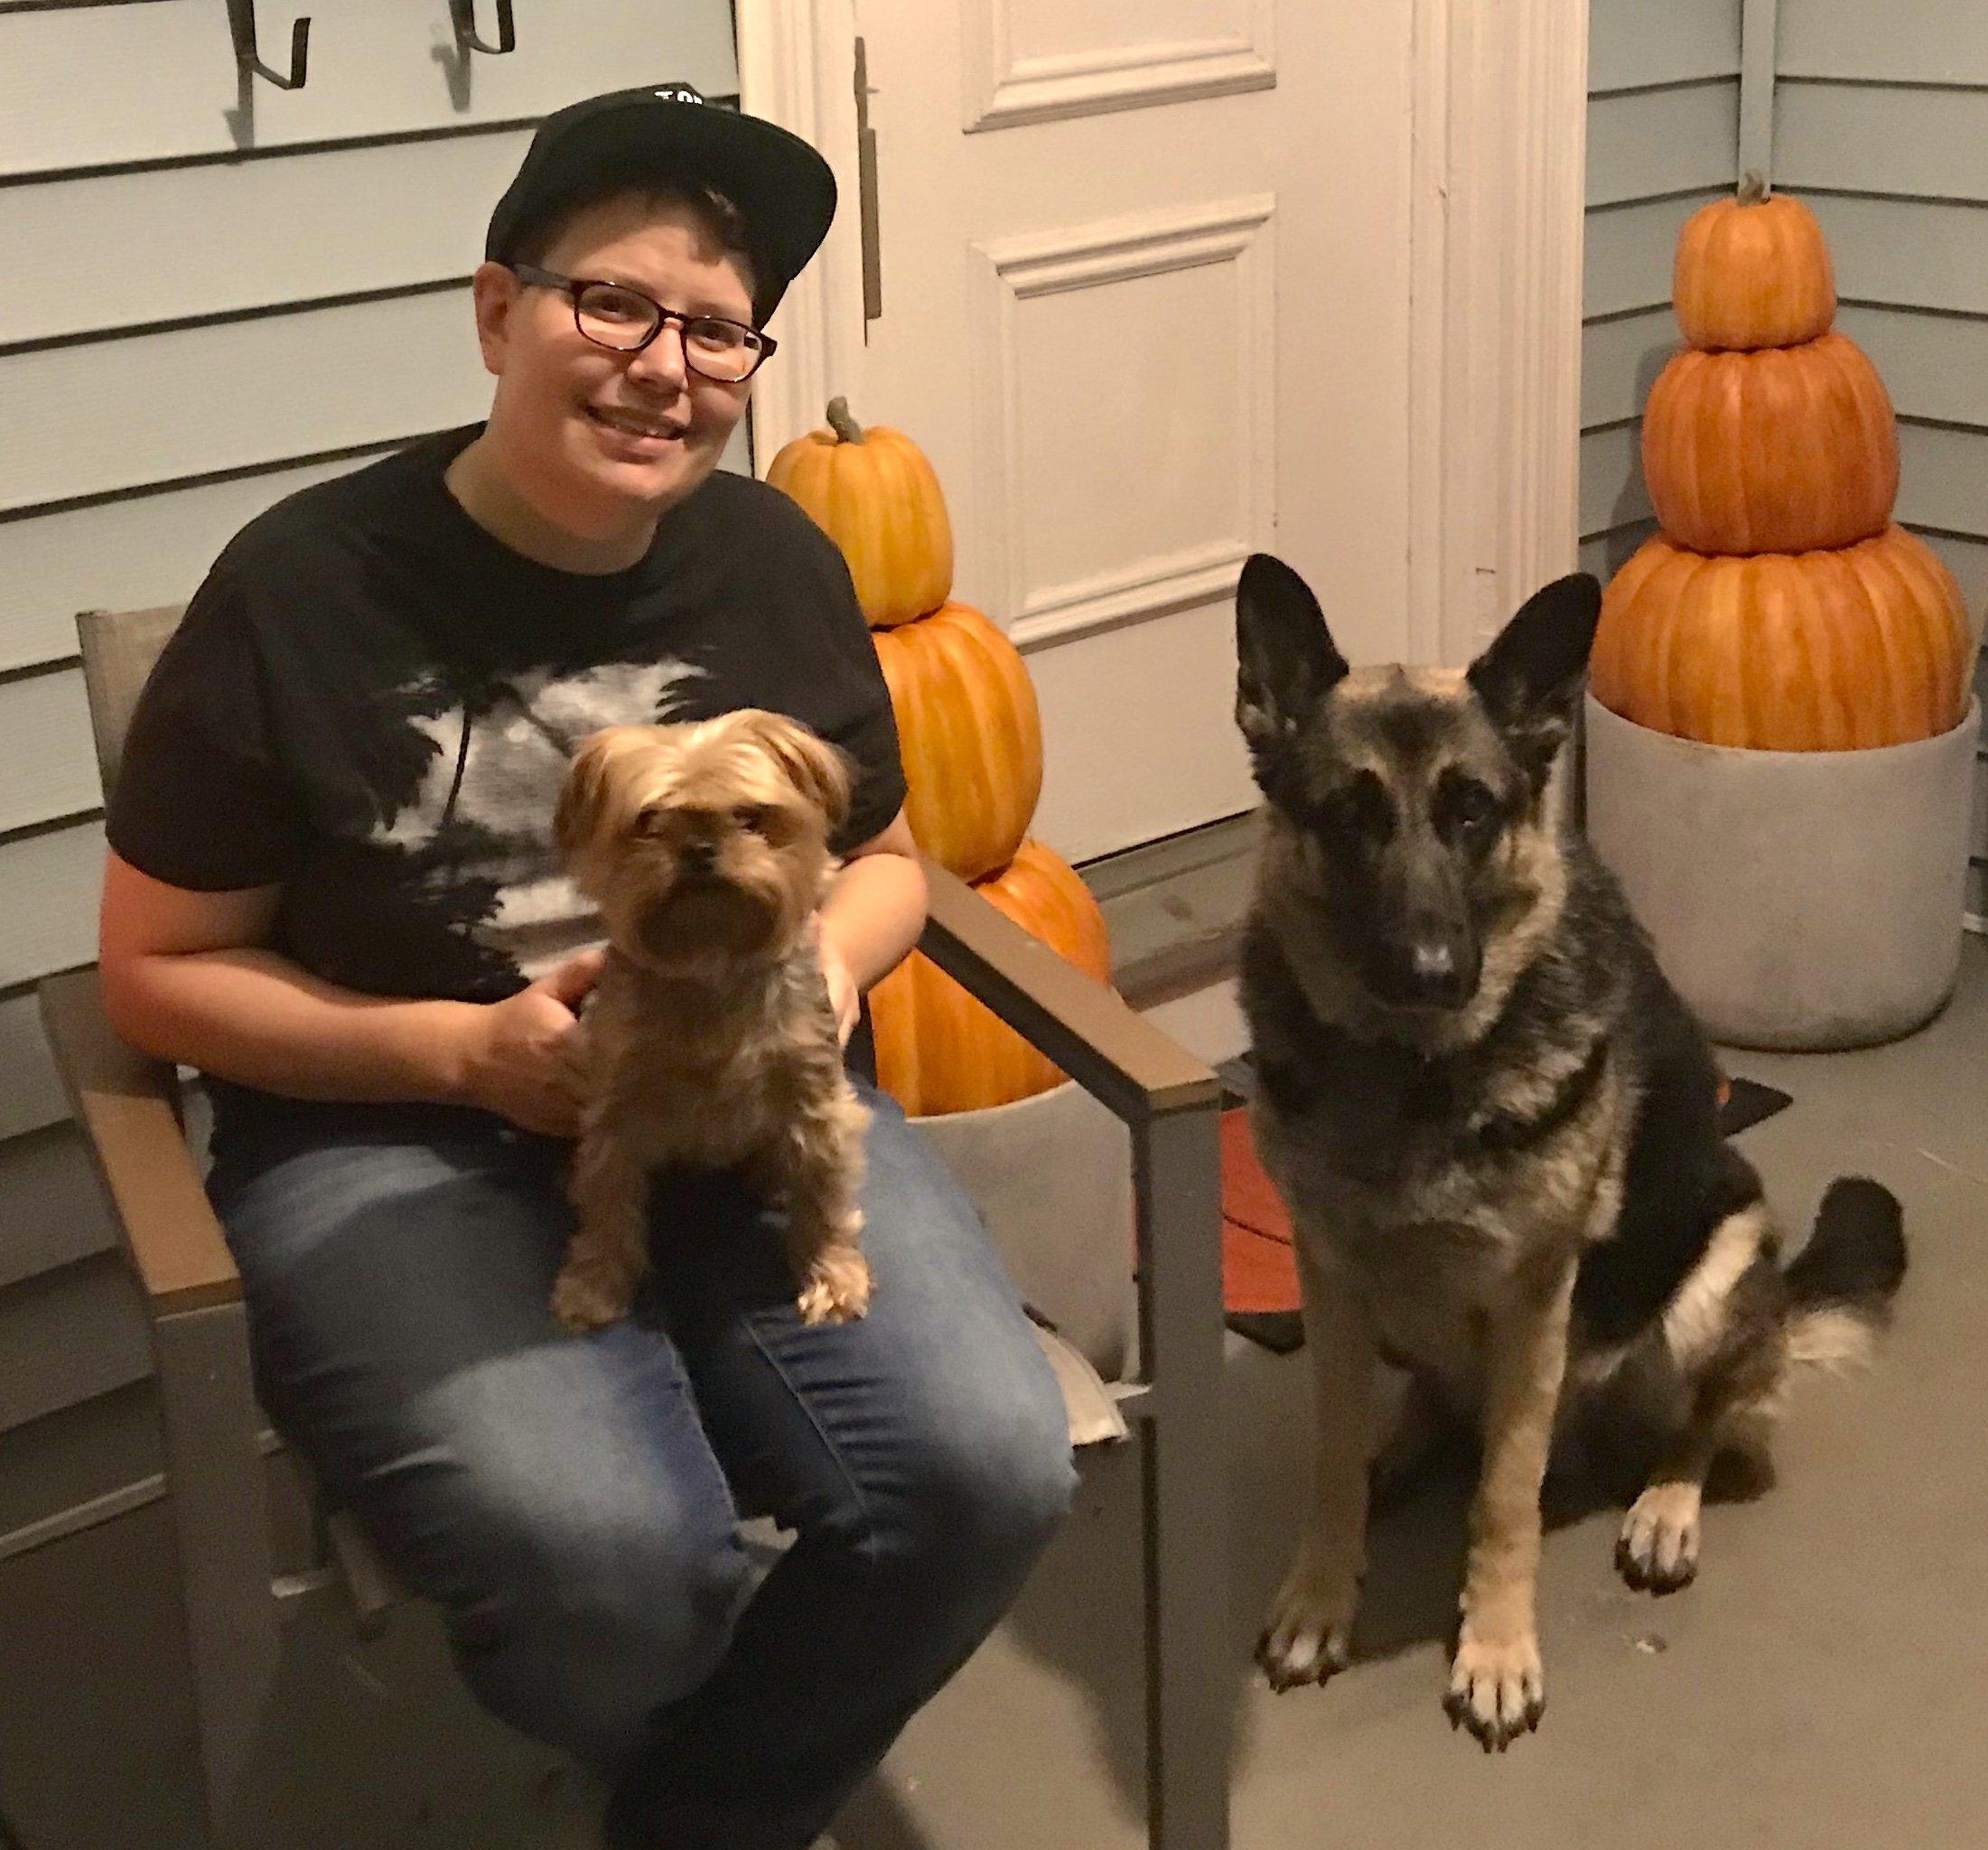 Me and Doggies